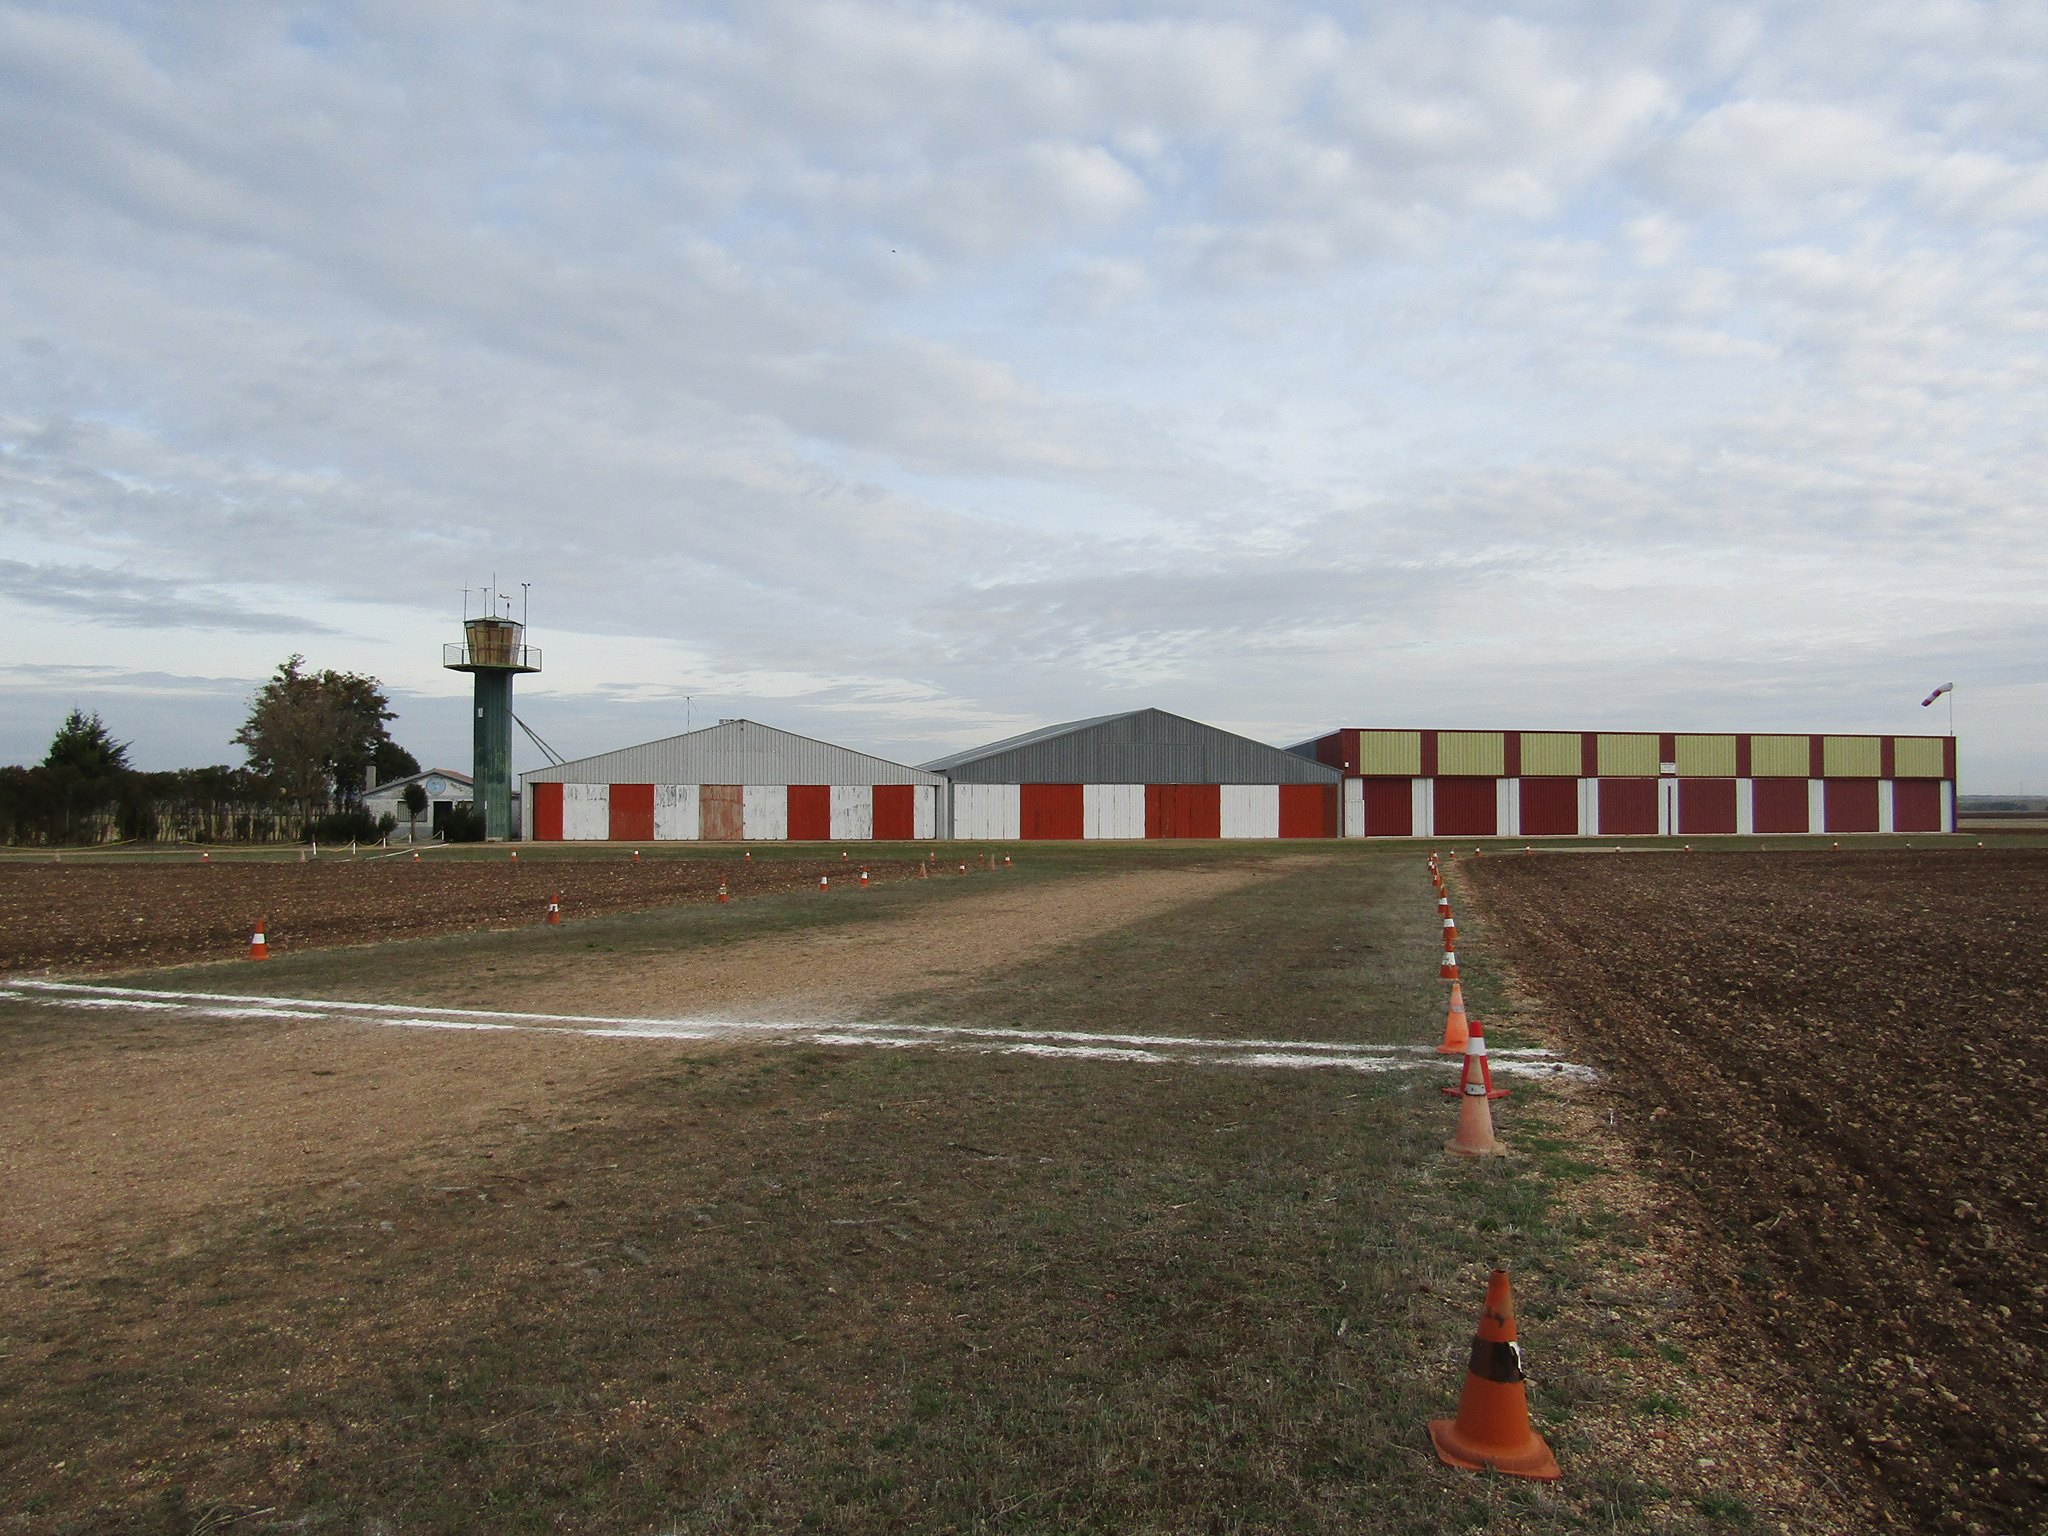 Aeródromo Calzada de Valdunciel LEUN